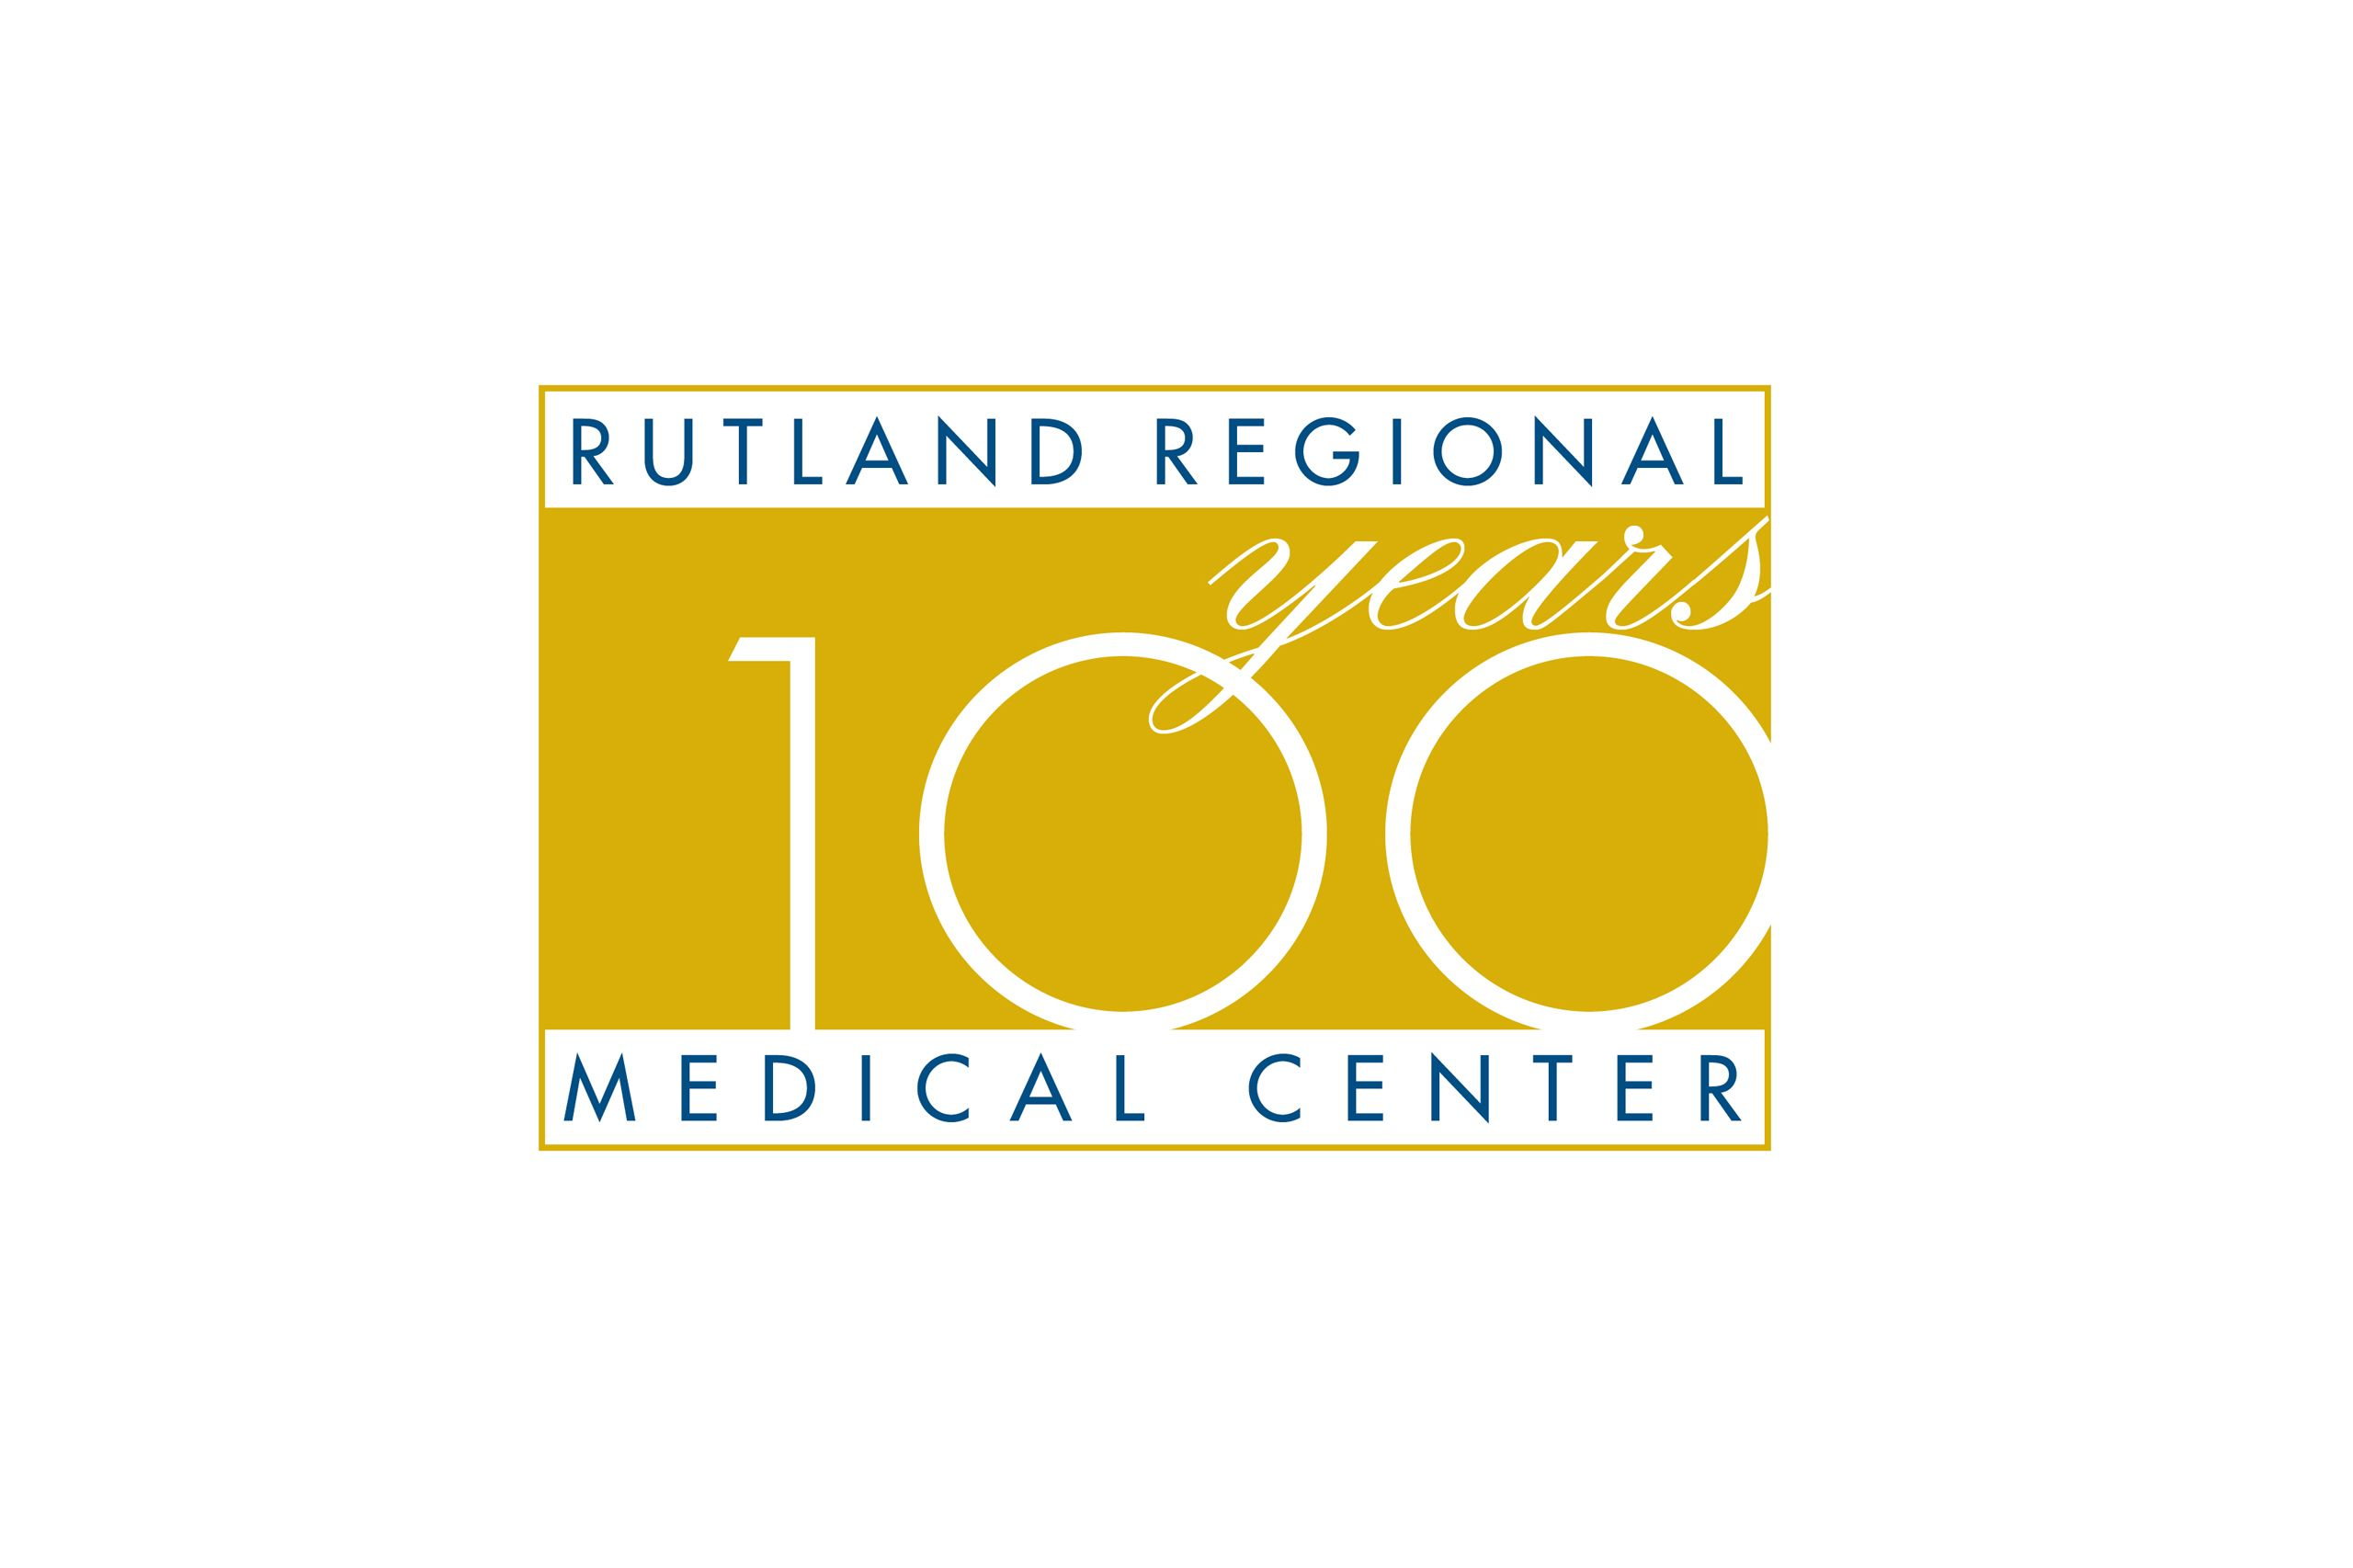 RRMC-logo.jpg